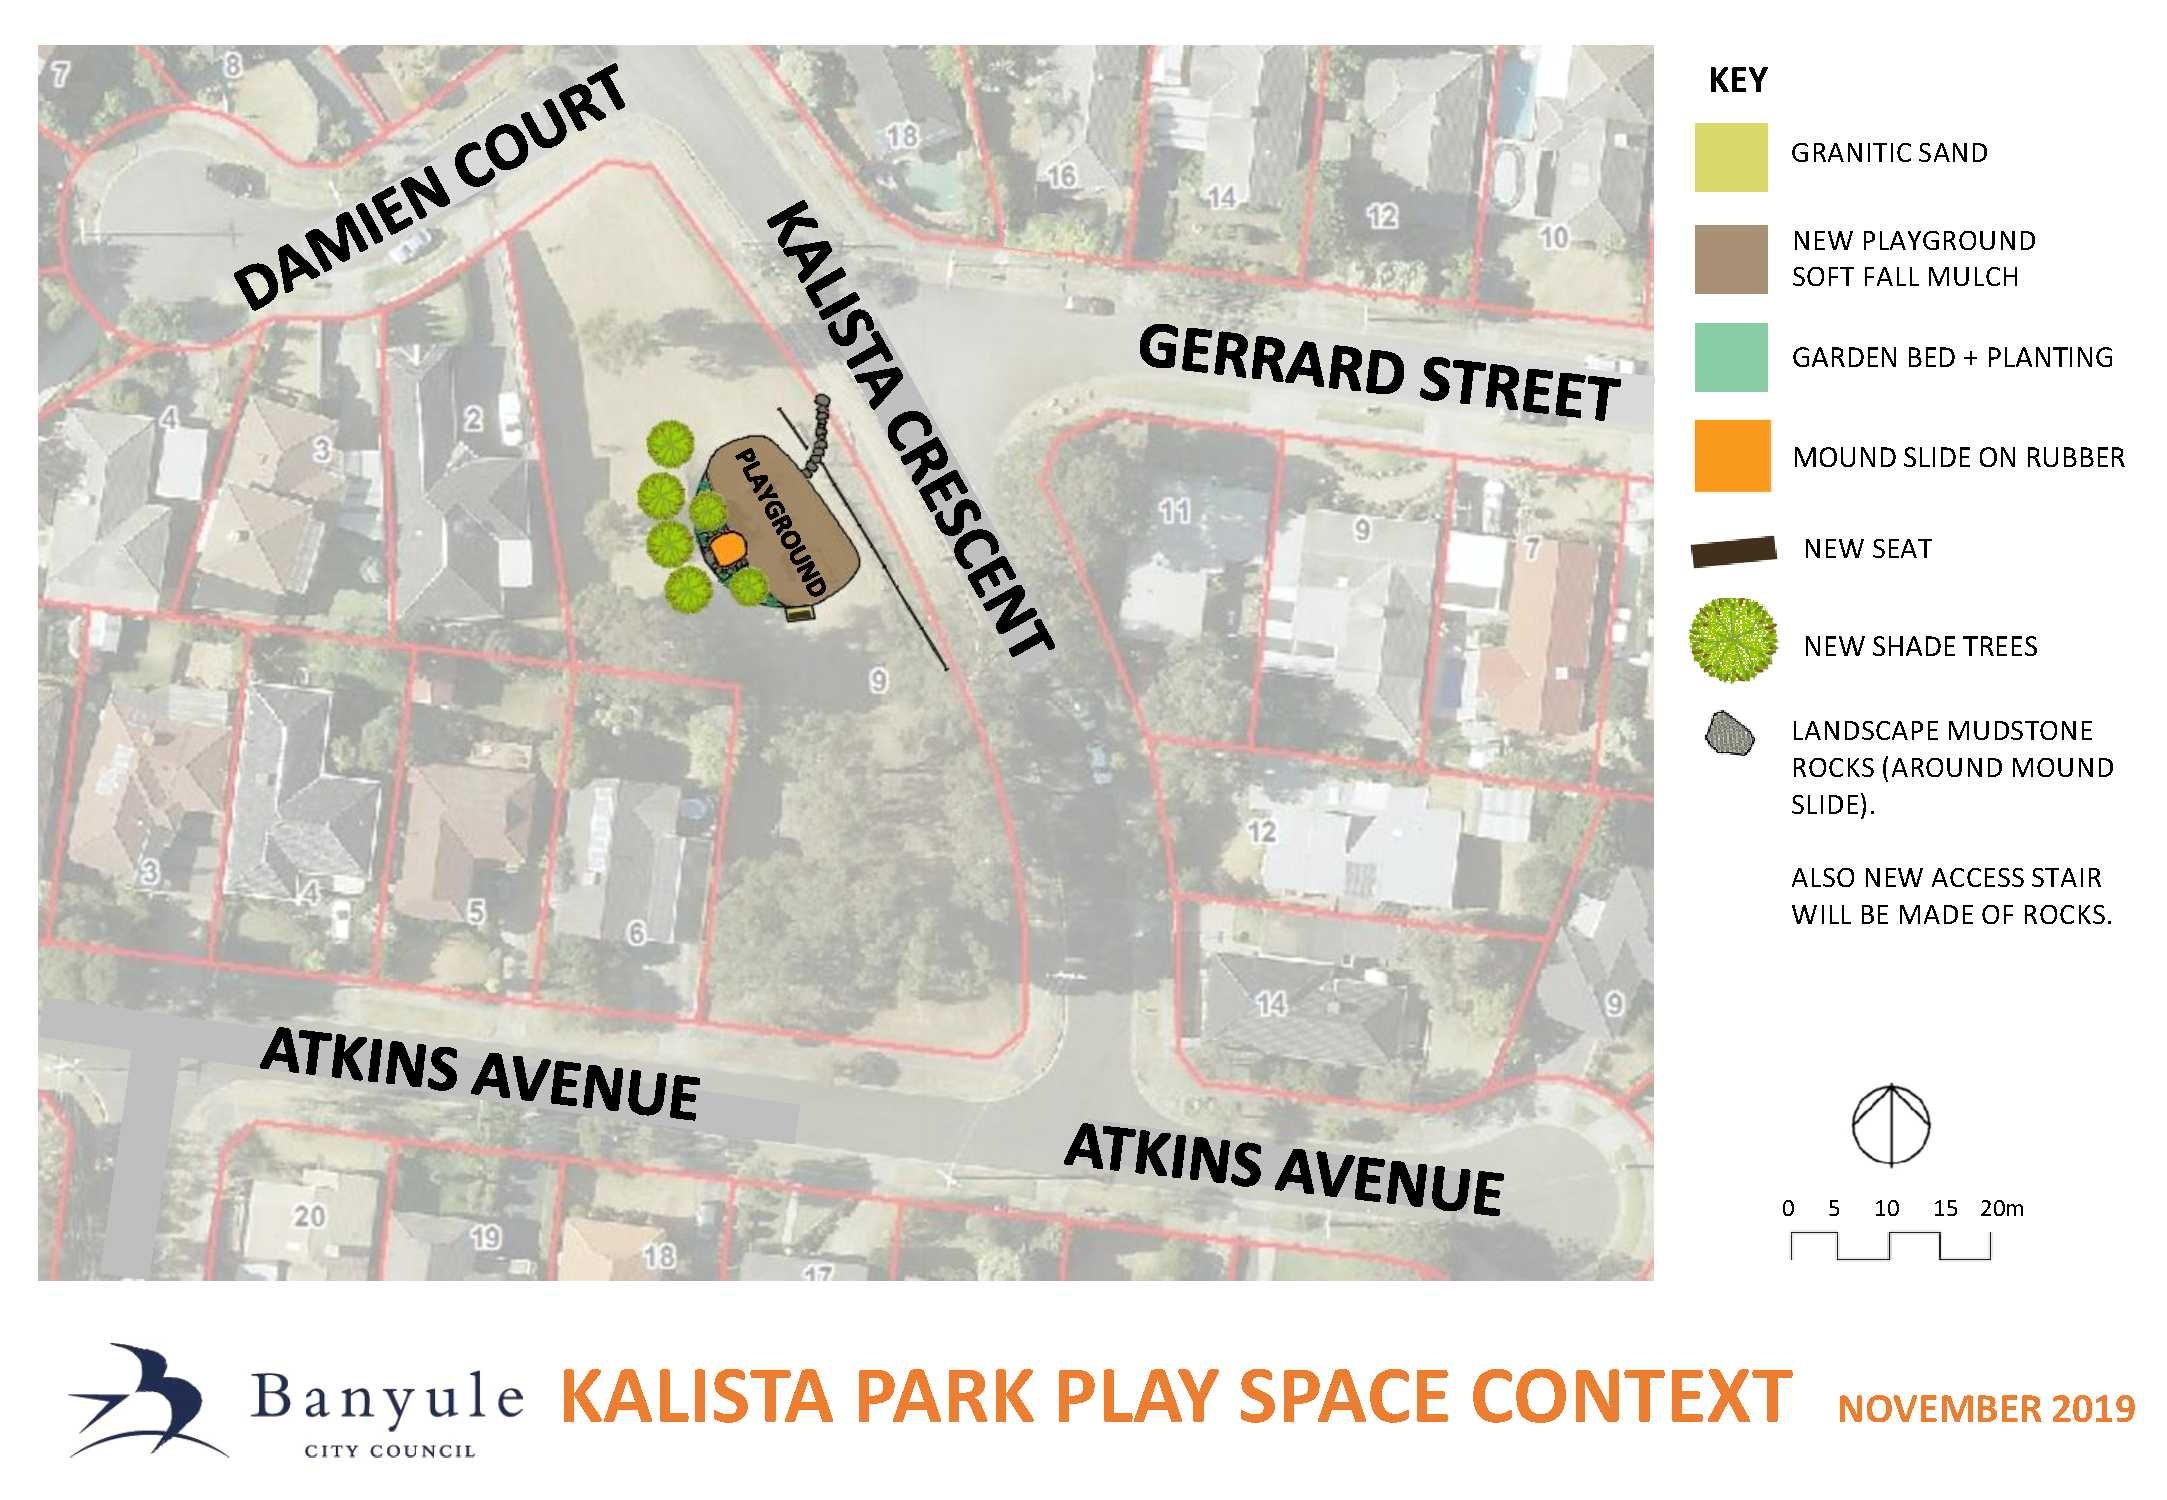 Kalista Park playground context plan